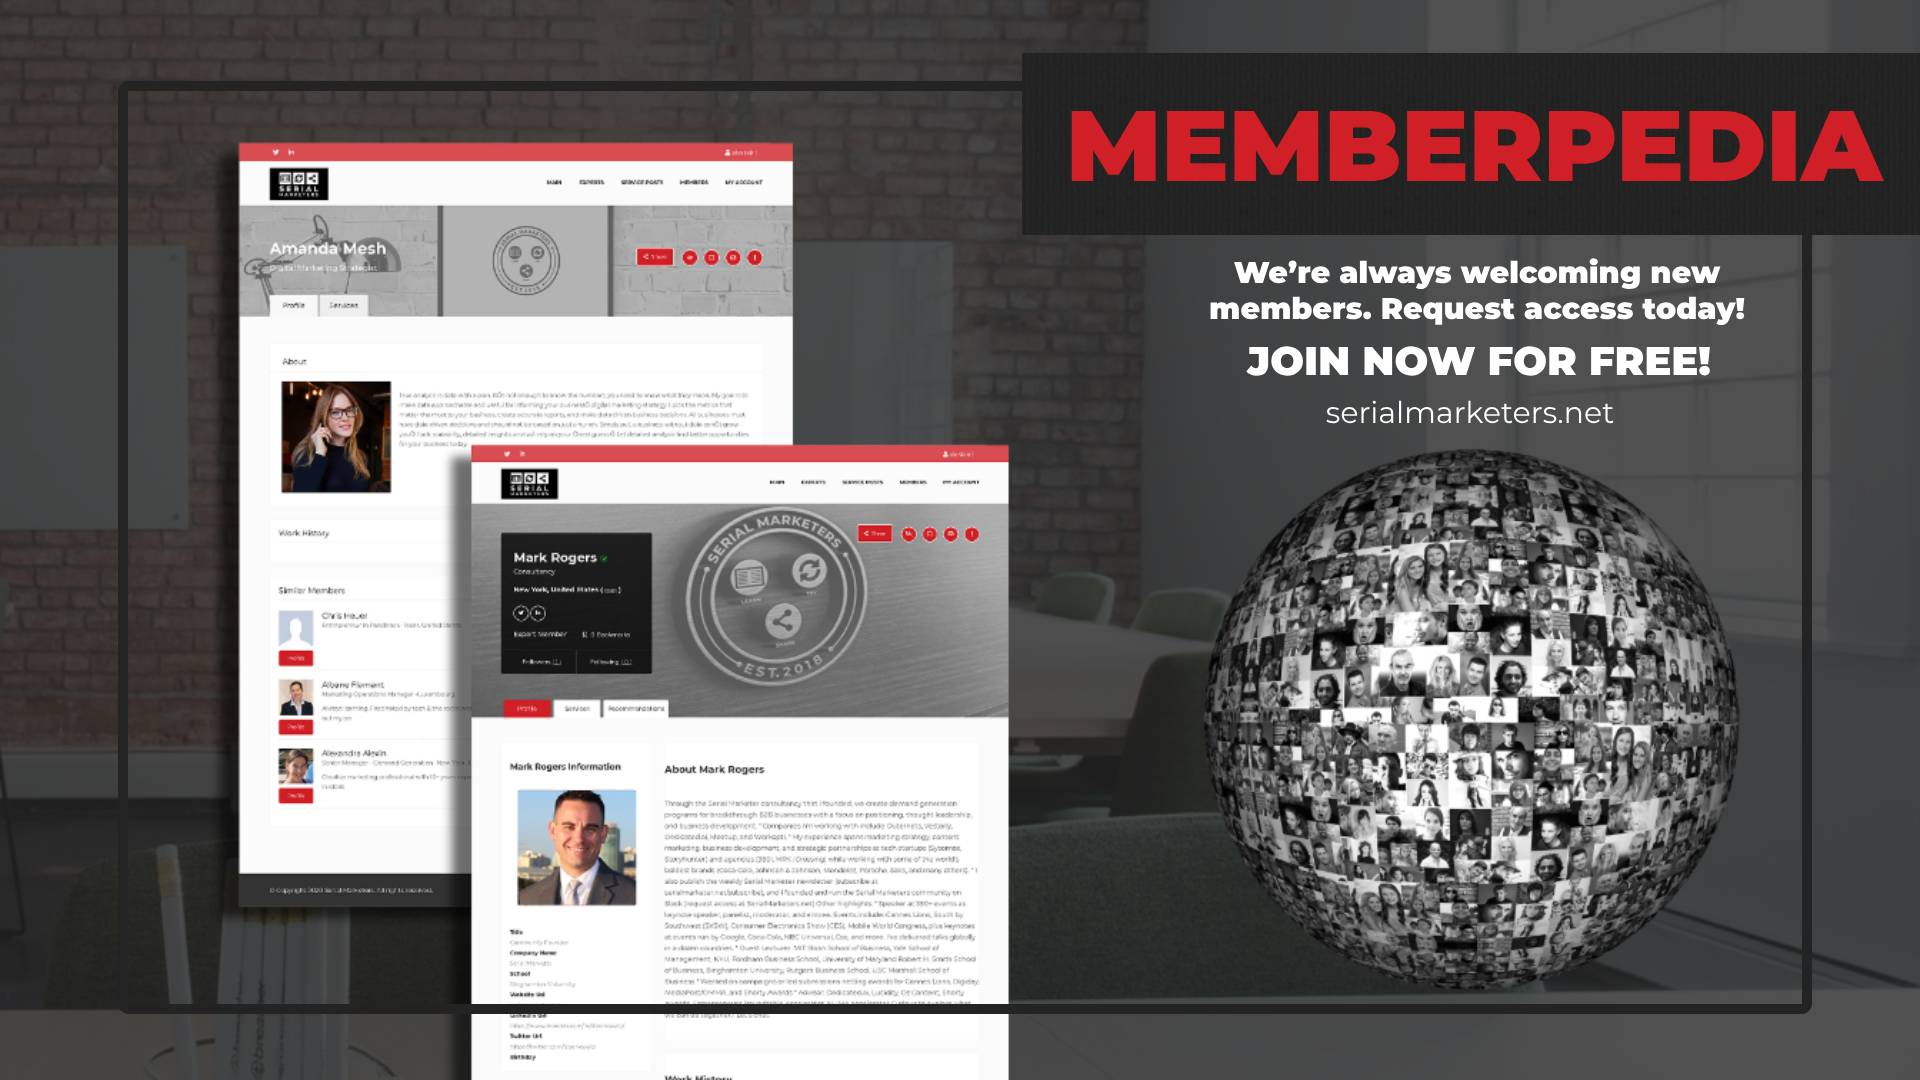 Memberpedia-Banner.jpg